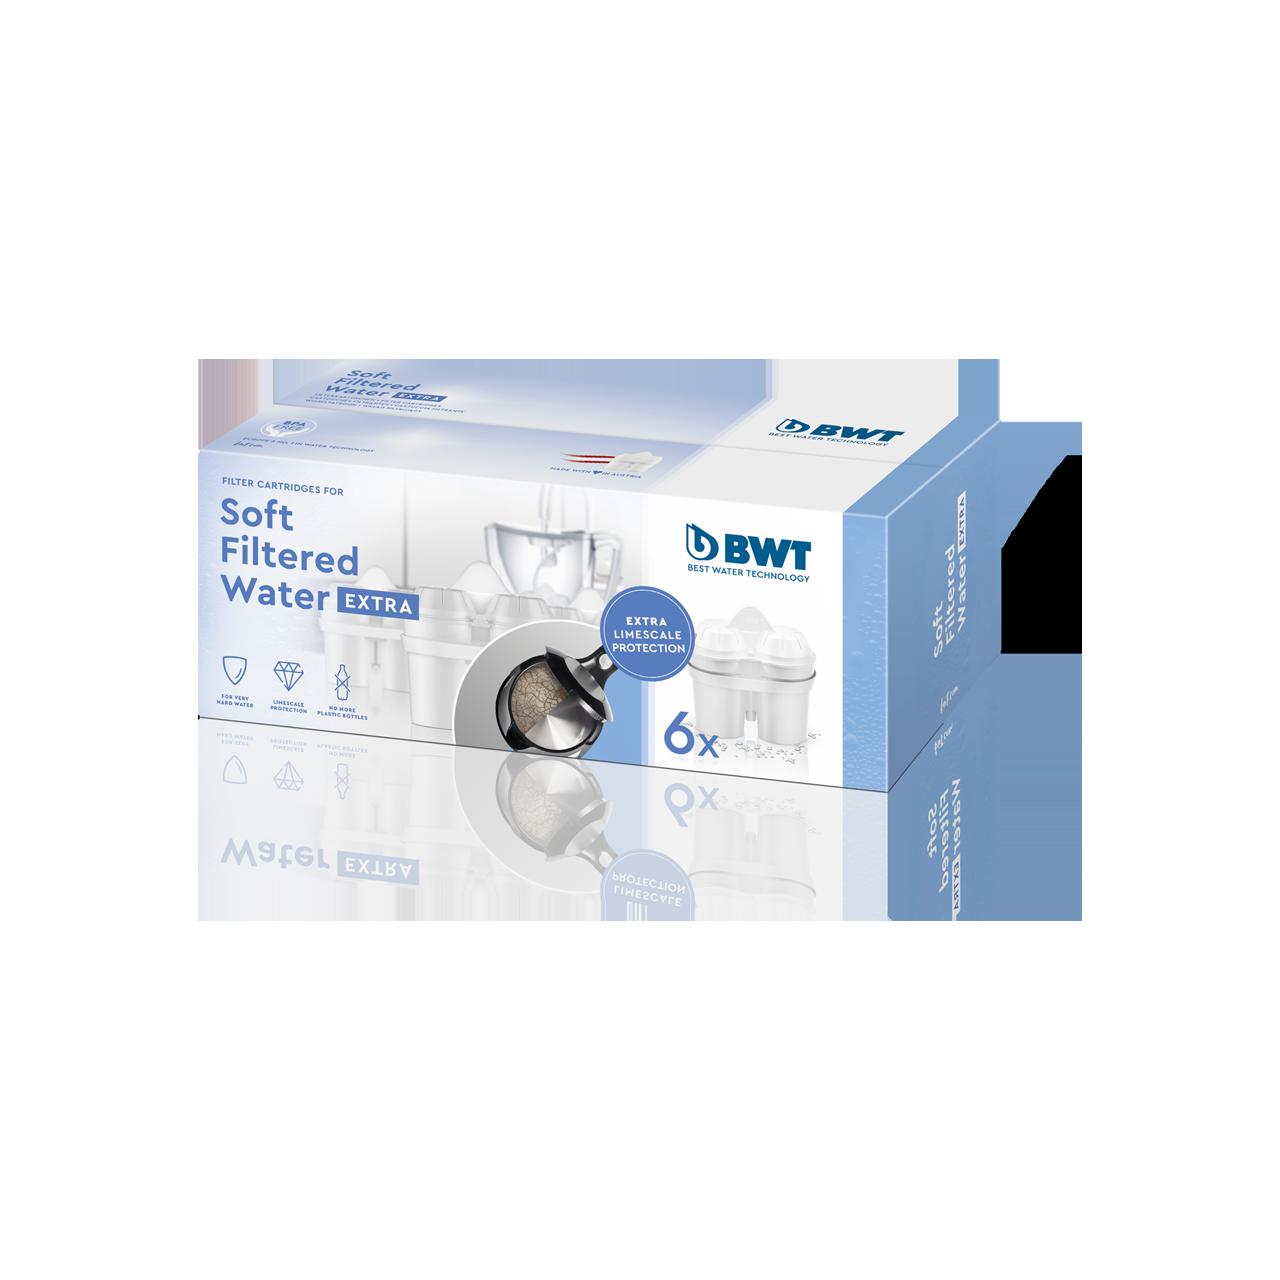 Soft Filtered Water EXTRA 6er Pack